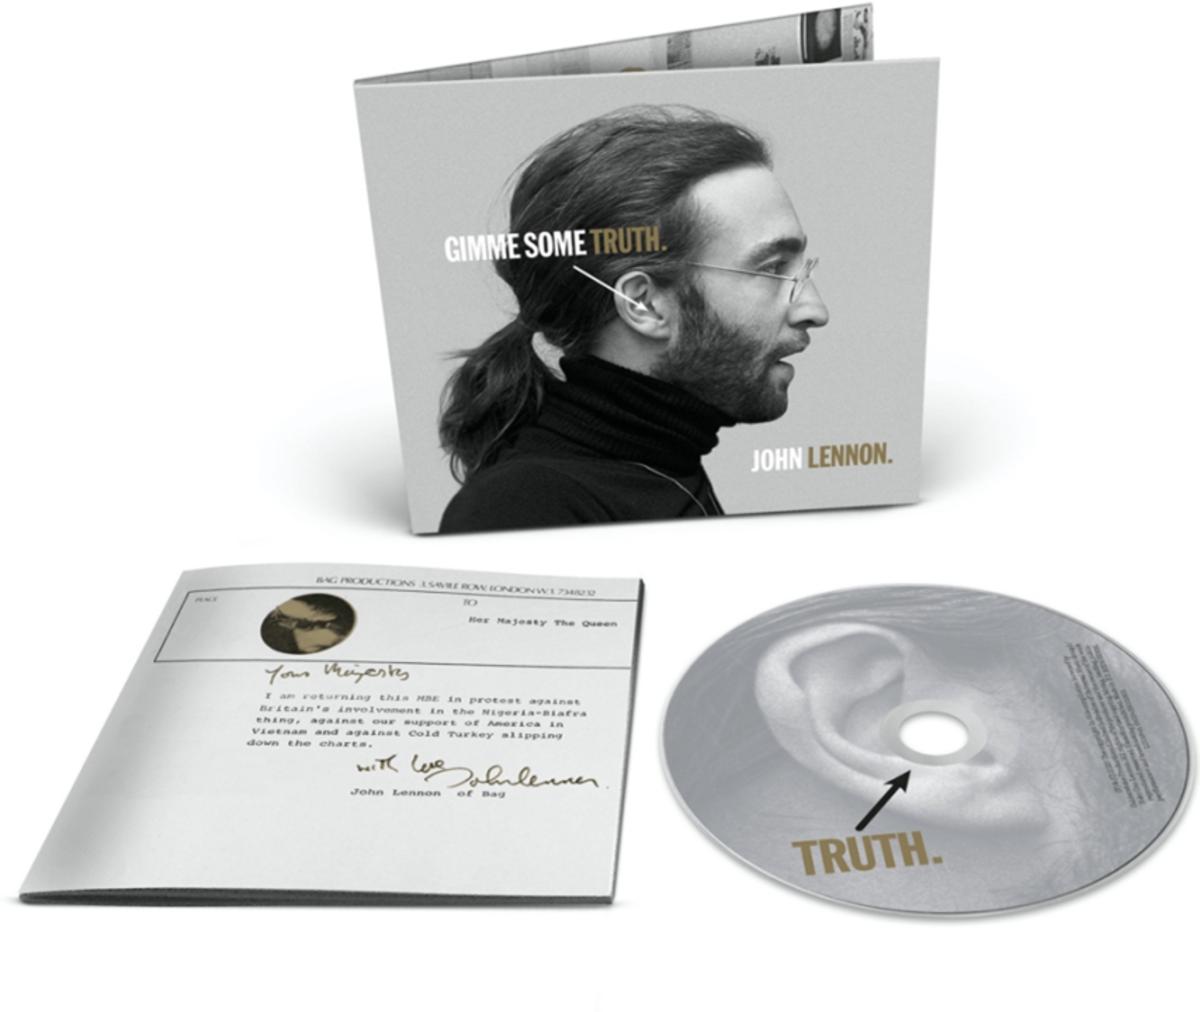 lennon-truth-cd